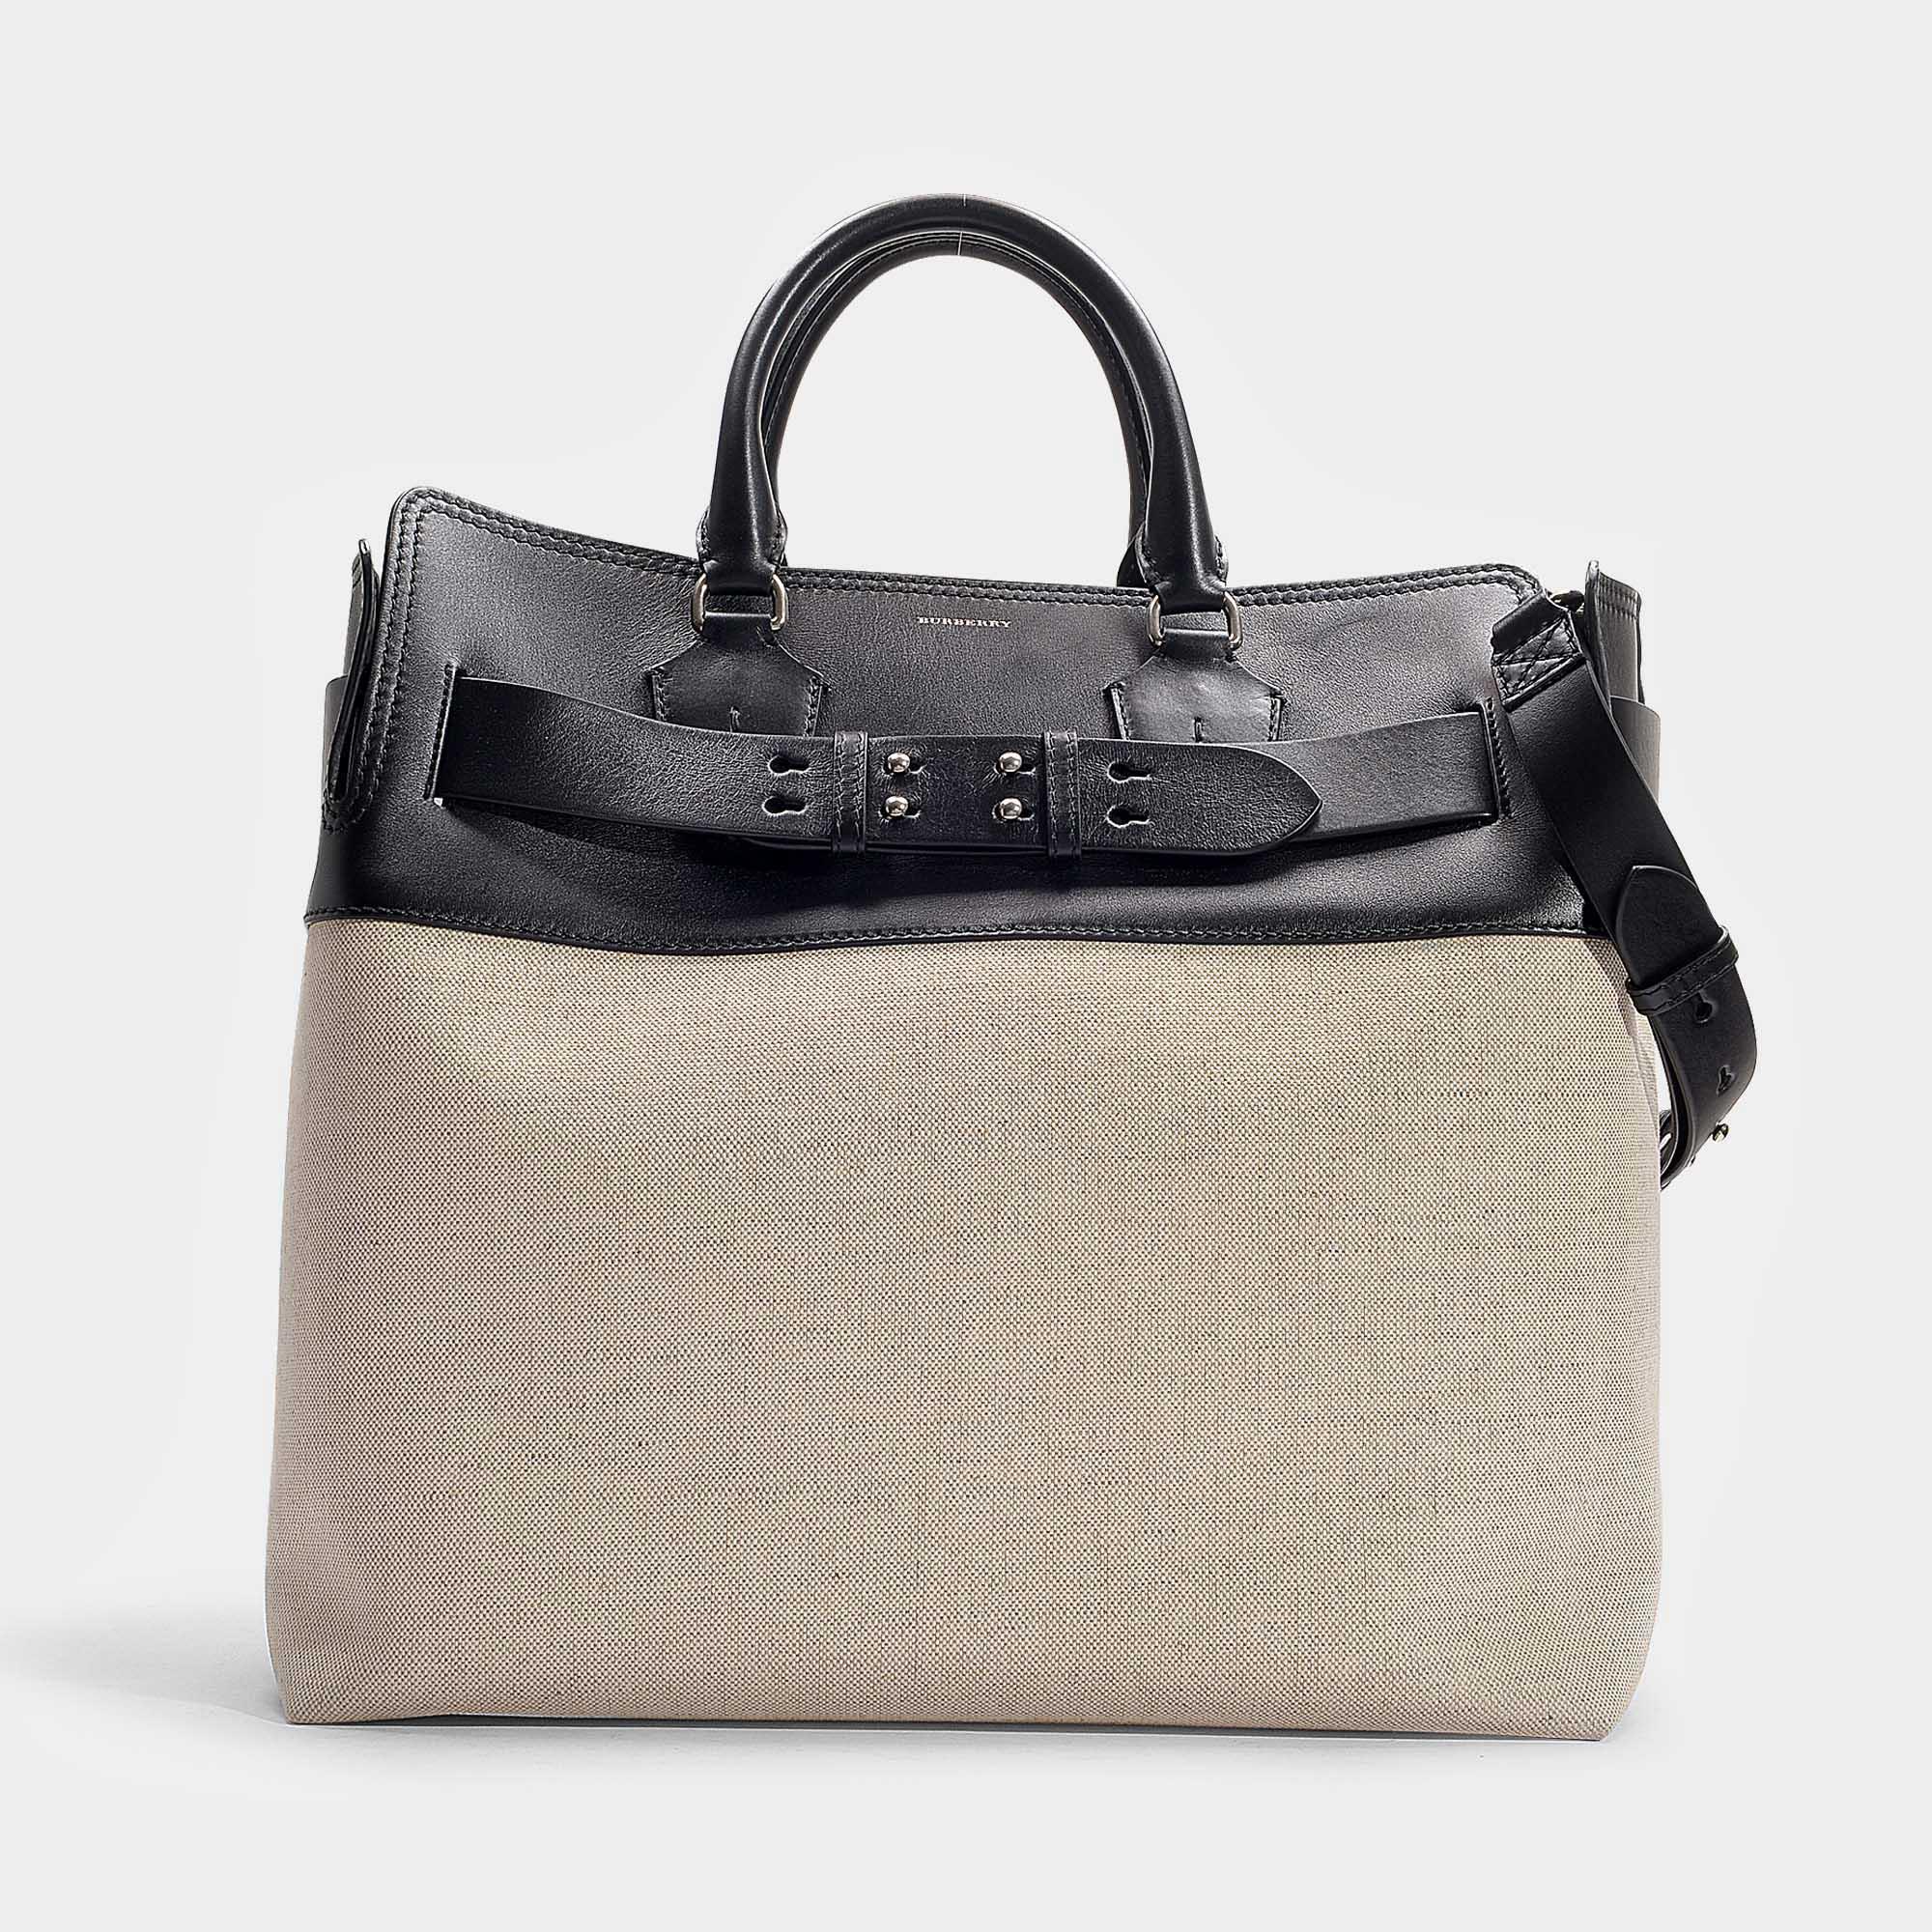 eca16a99a2b Lyst - Grand sac à main belt en cuir de veau noir Burberry en ...